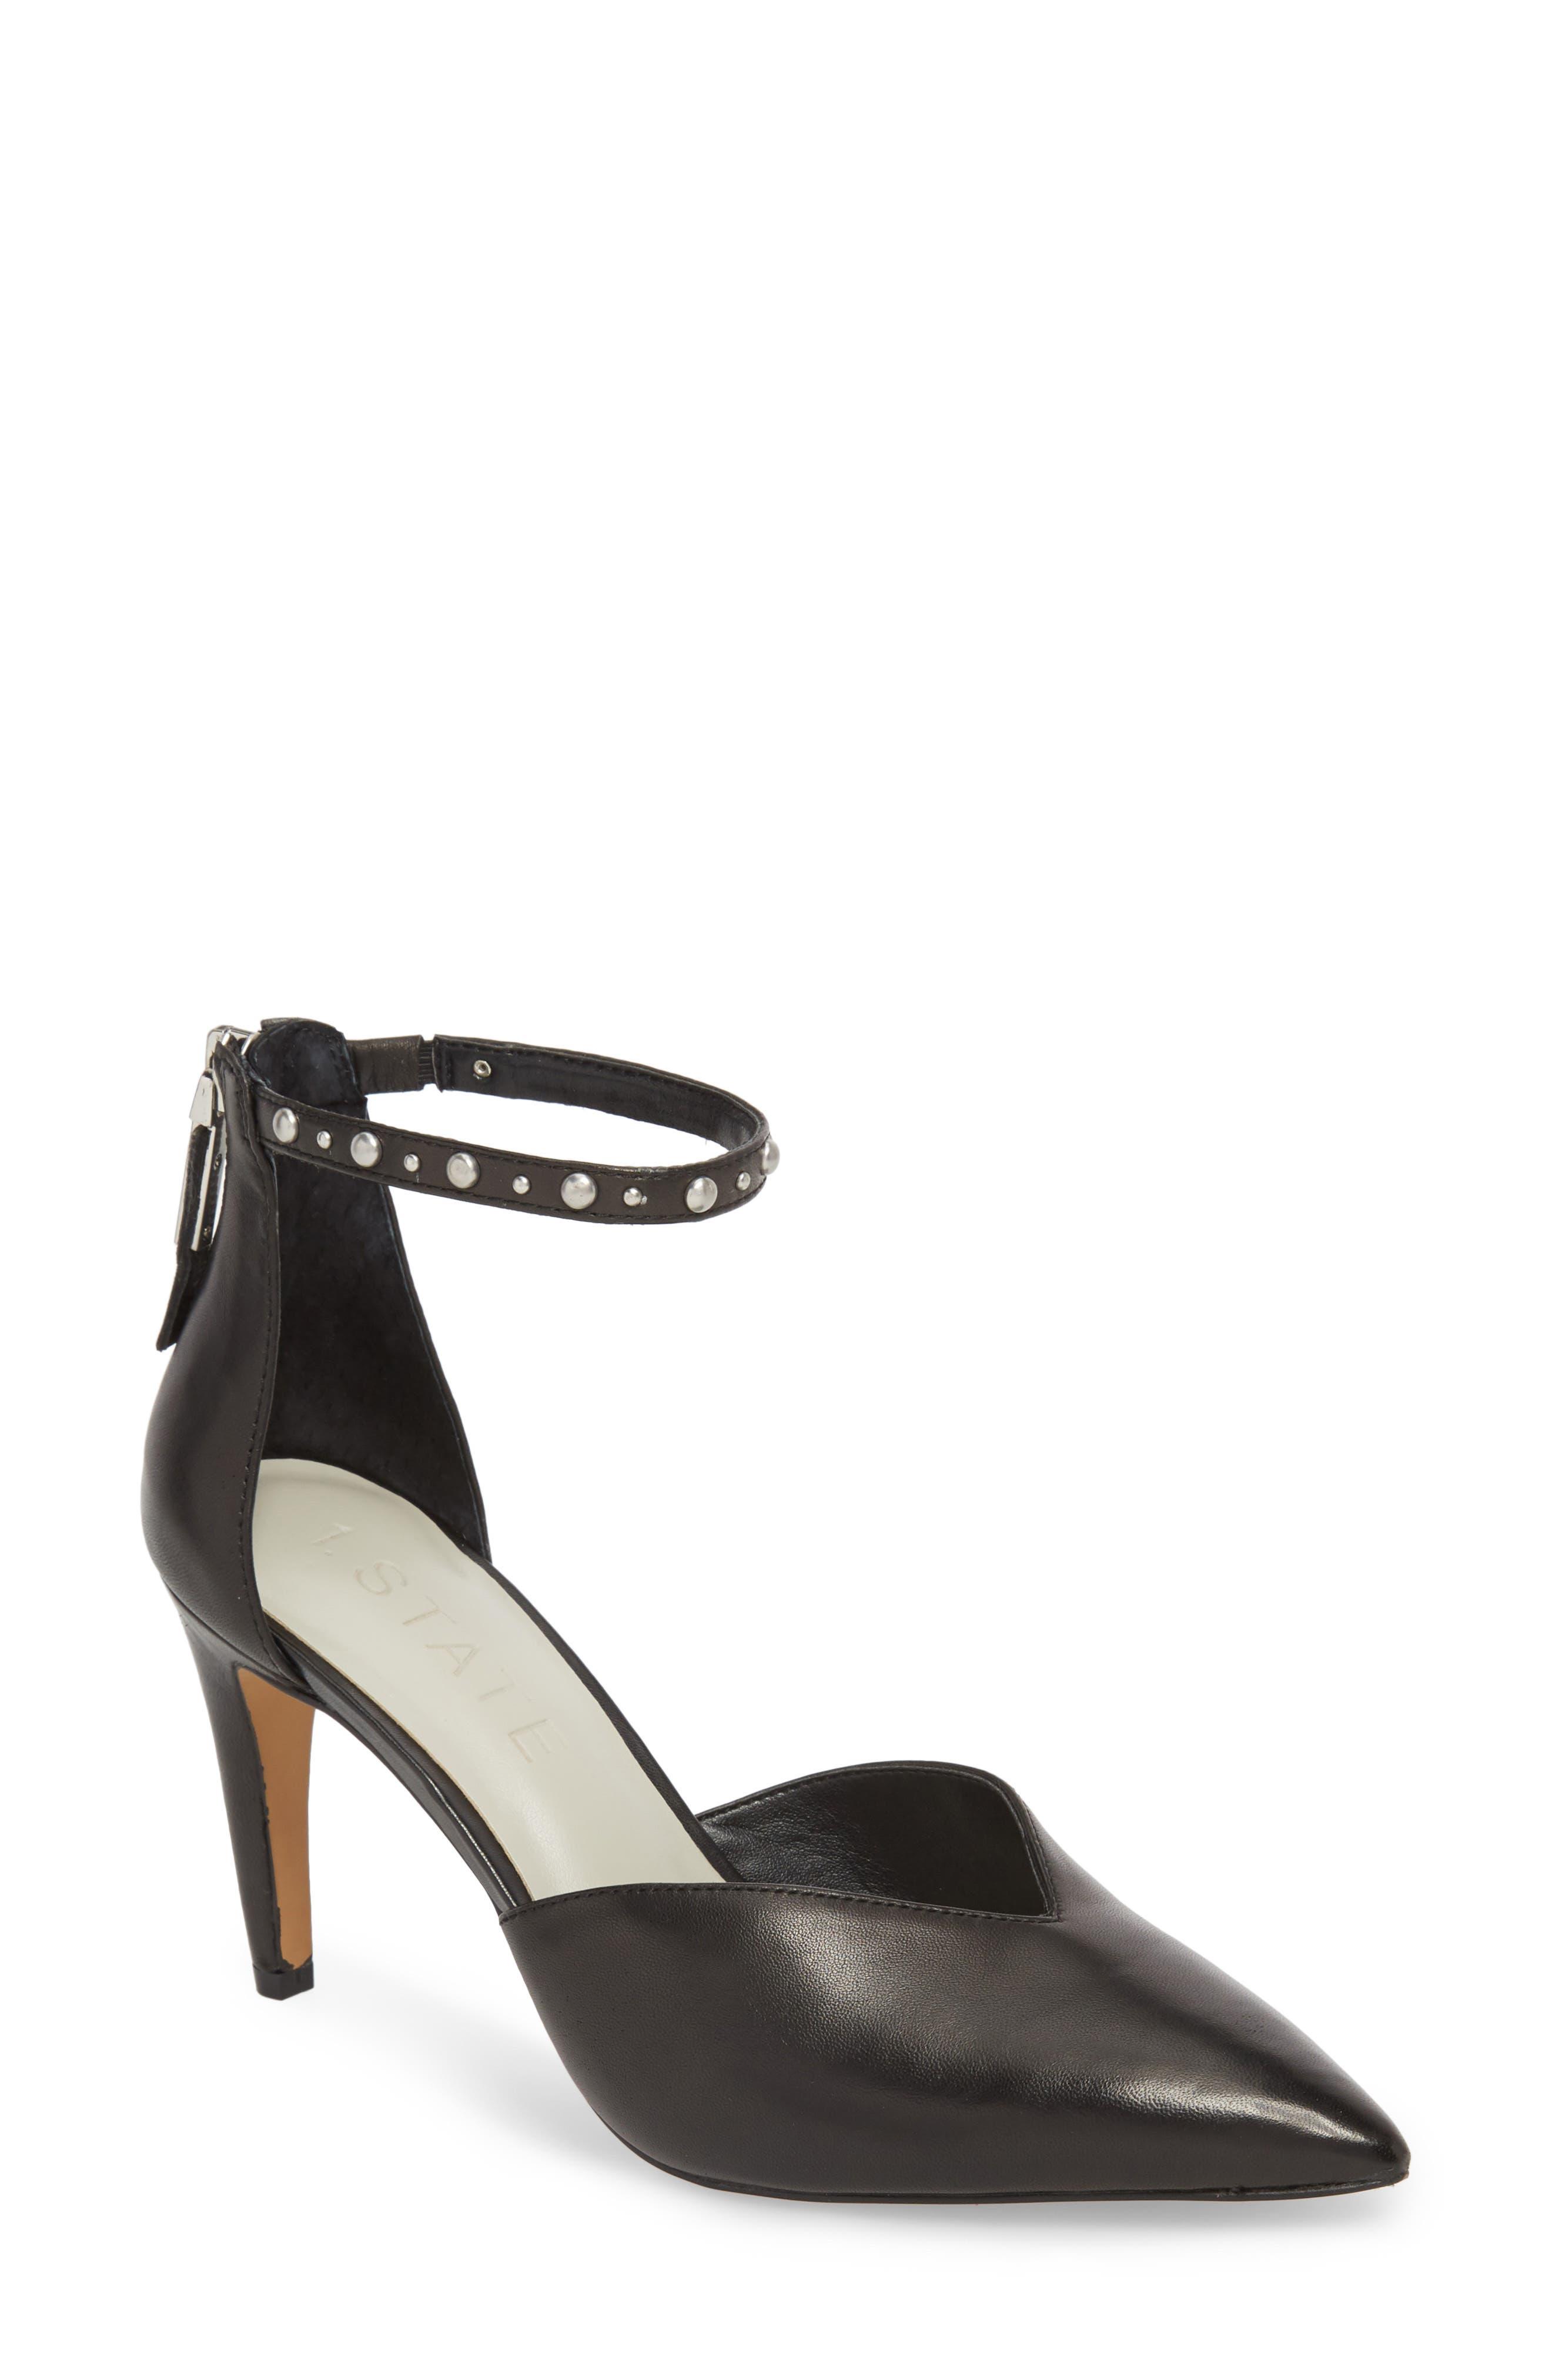 Haylee Pump,                         Main,                         color, Black Leather